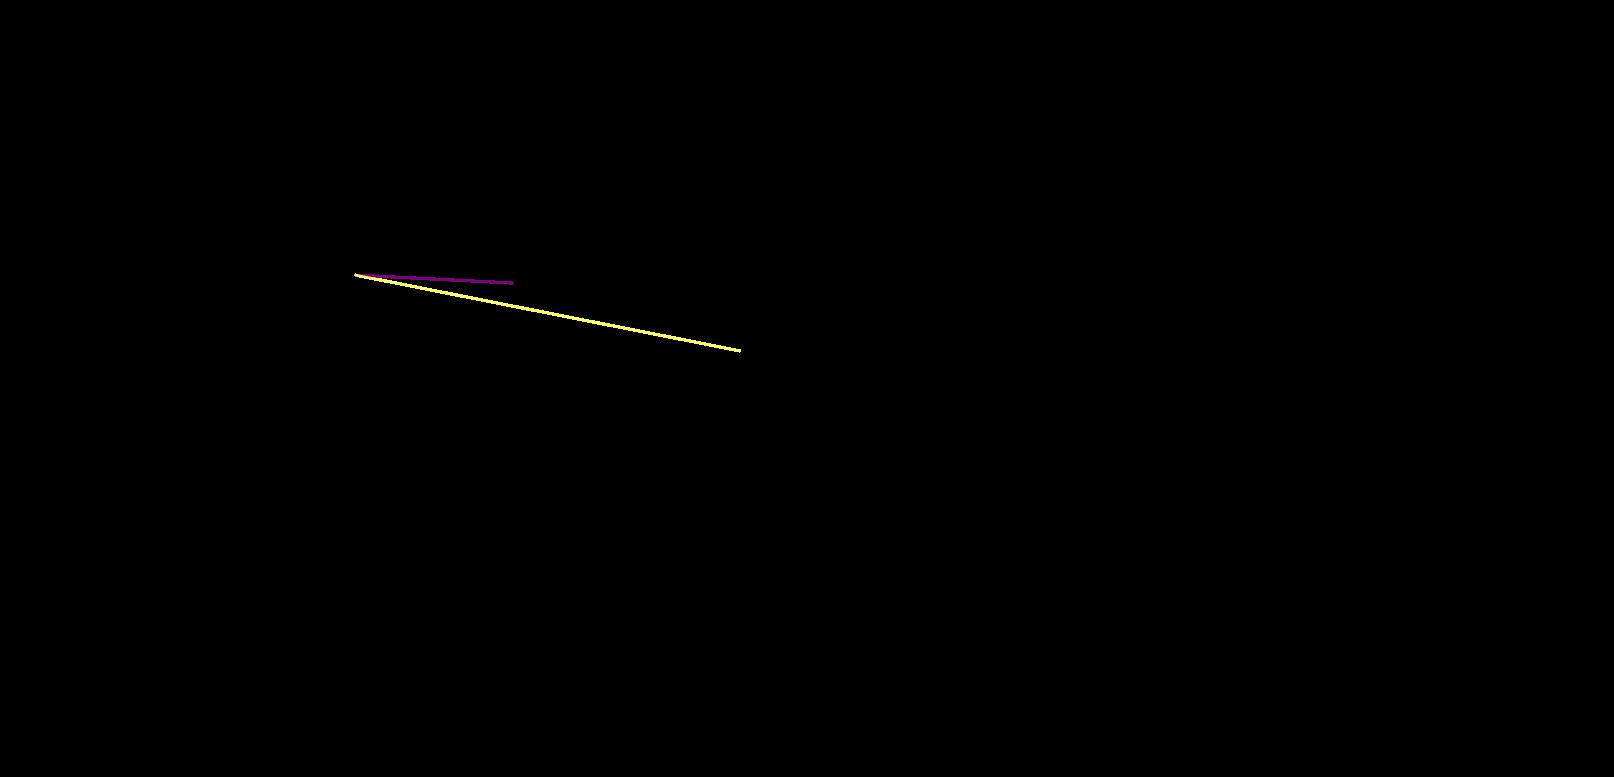 Animacja P.S. 2b